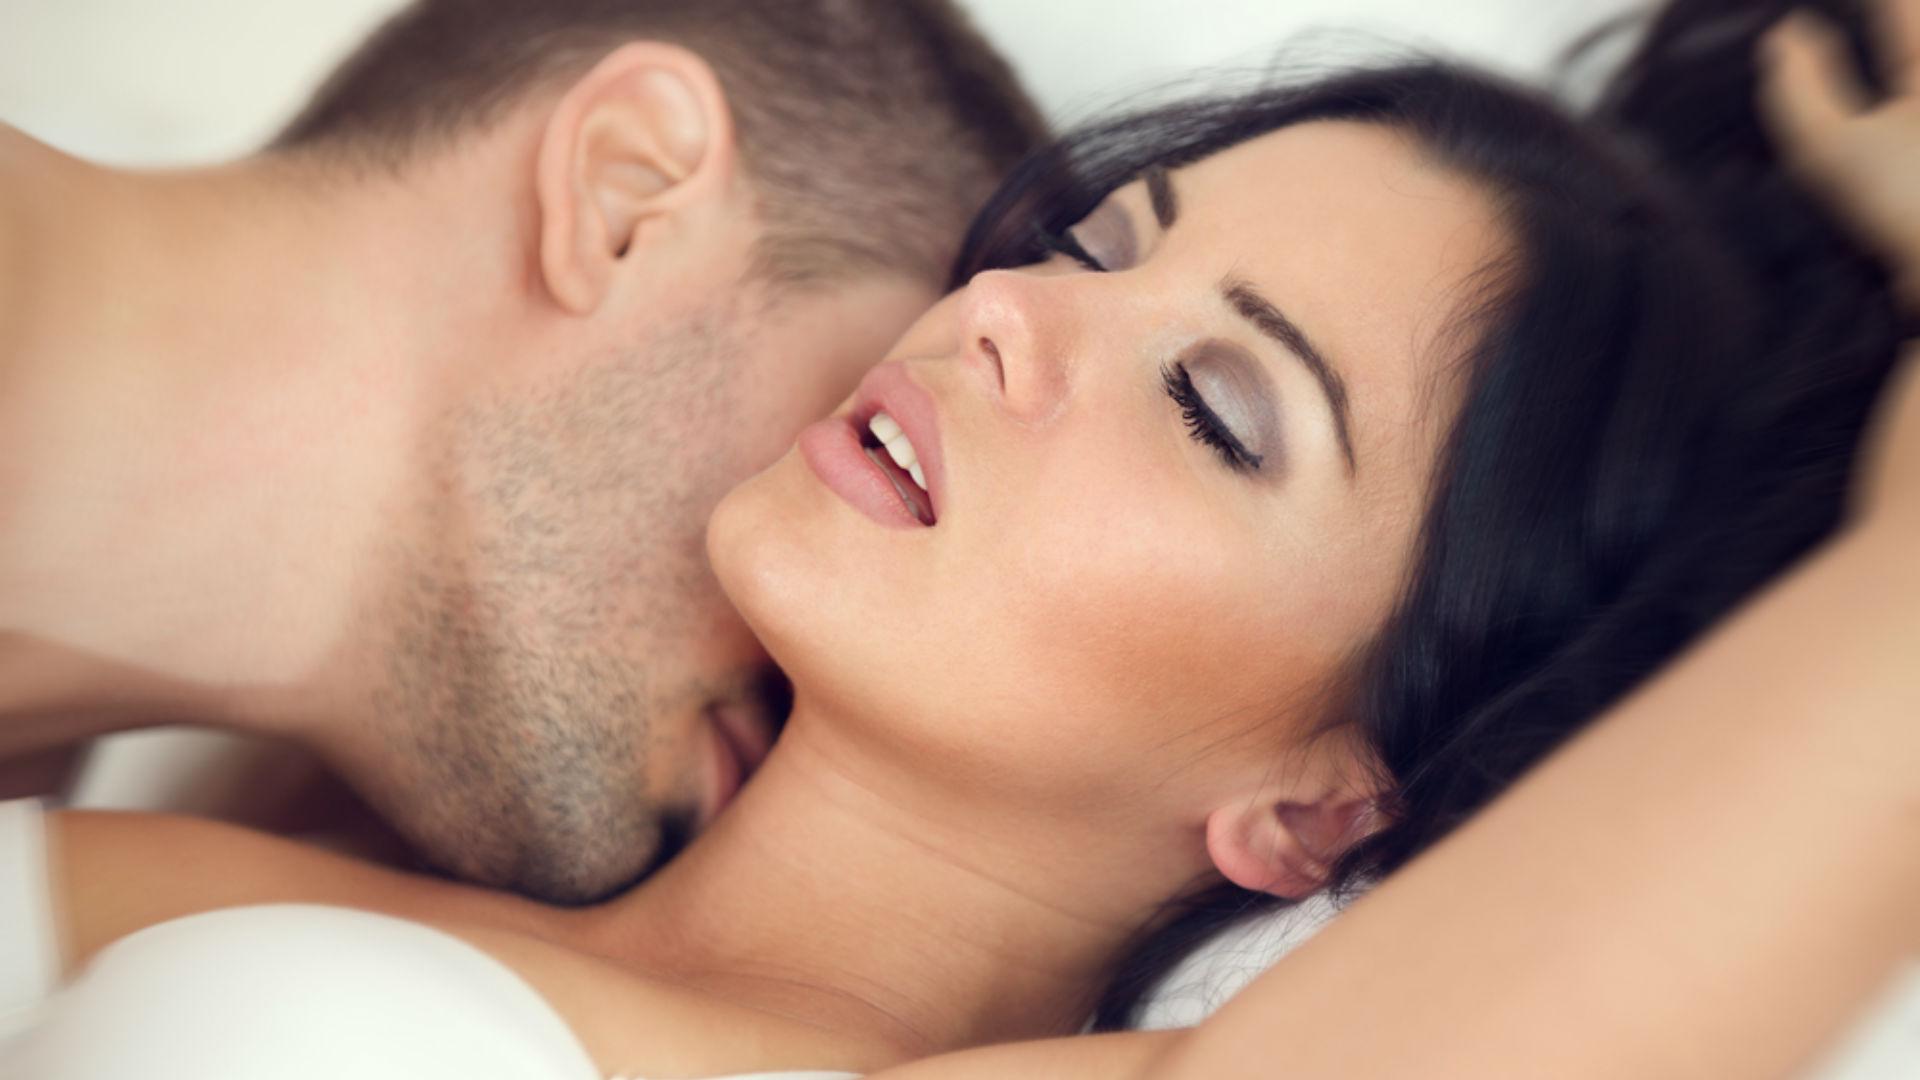 Sexo mujere arnes Virrey del Pino 2622